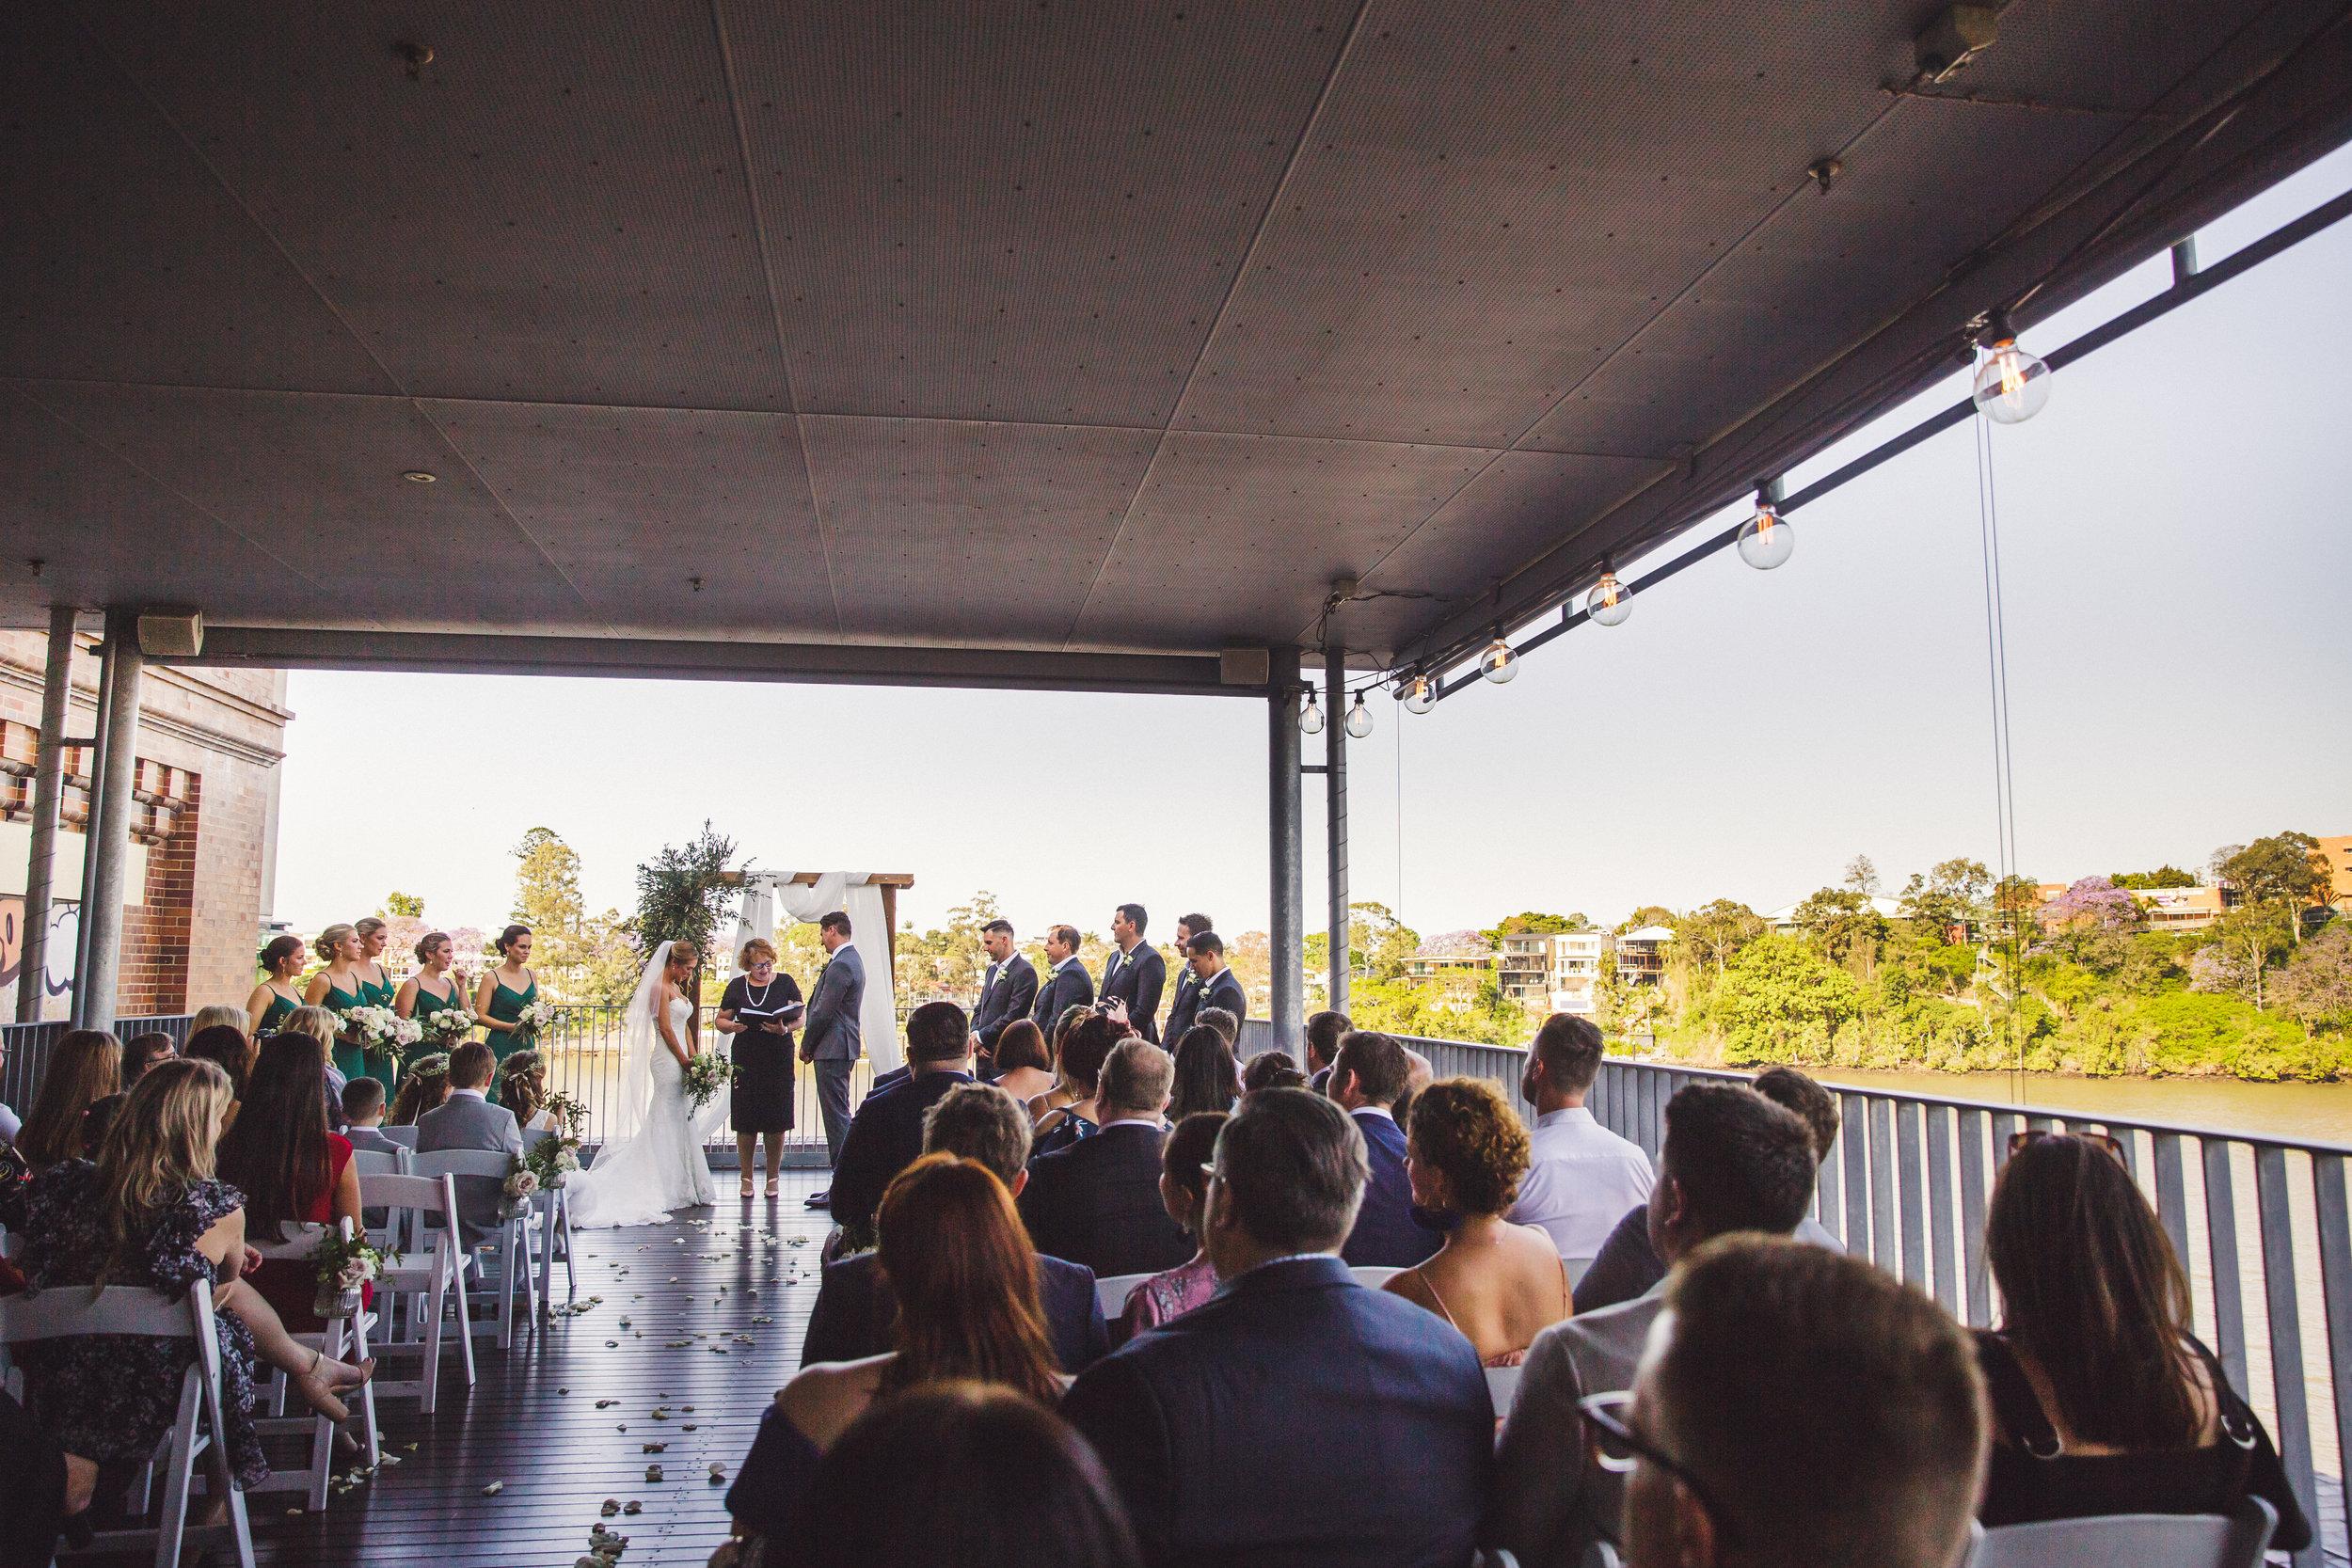 lightspace-brisbane-wedding-017.JPG